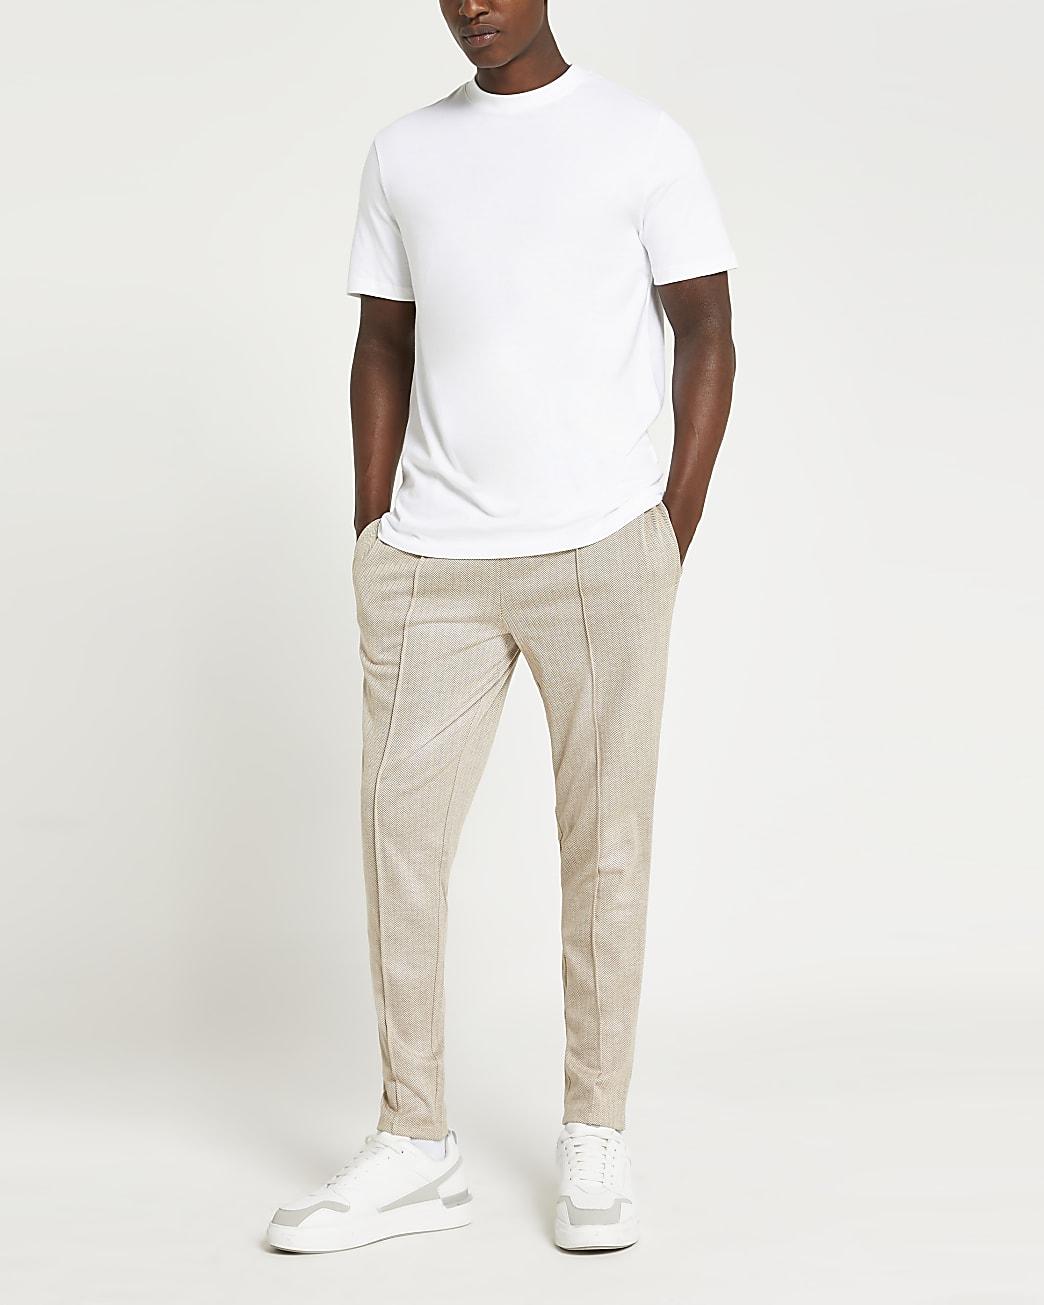 Stone herringbone joggers and t-shirt set